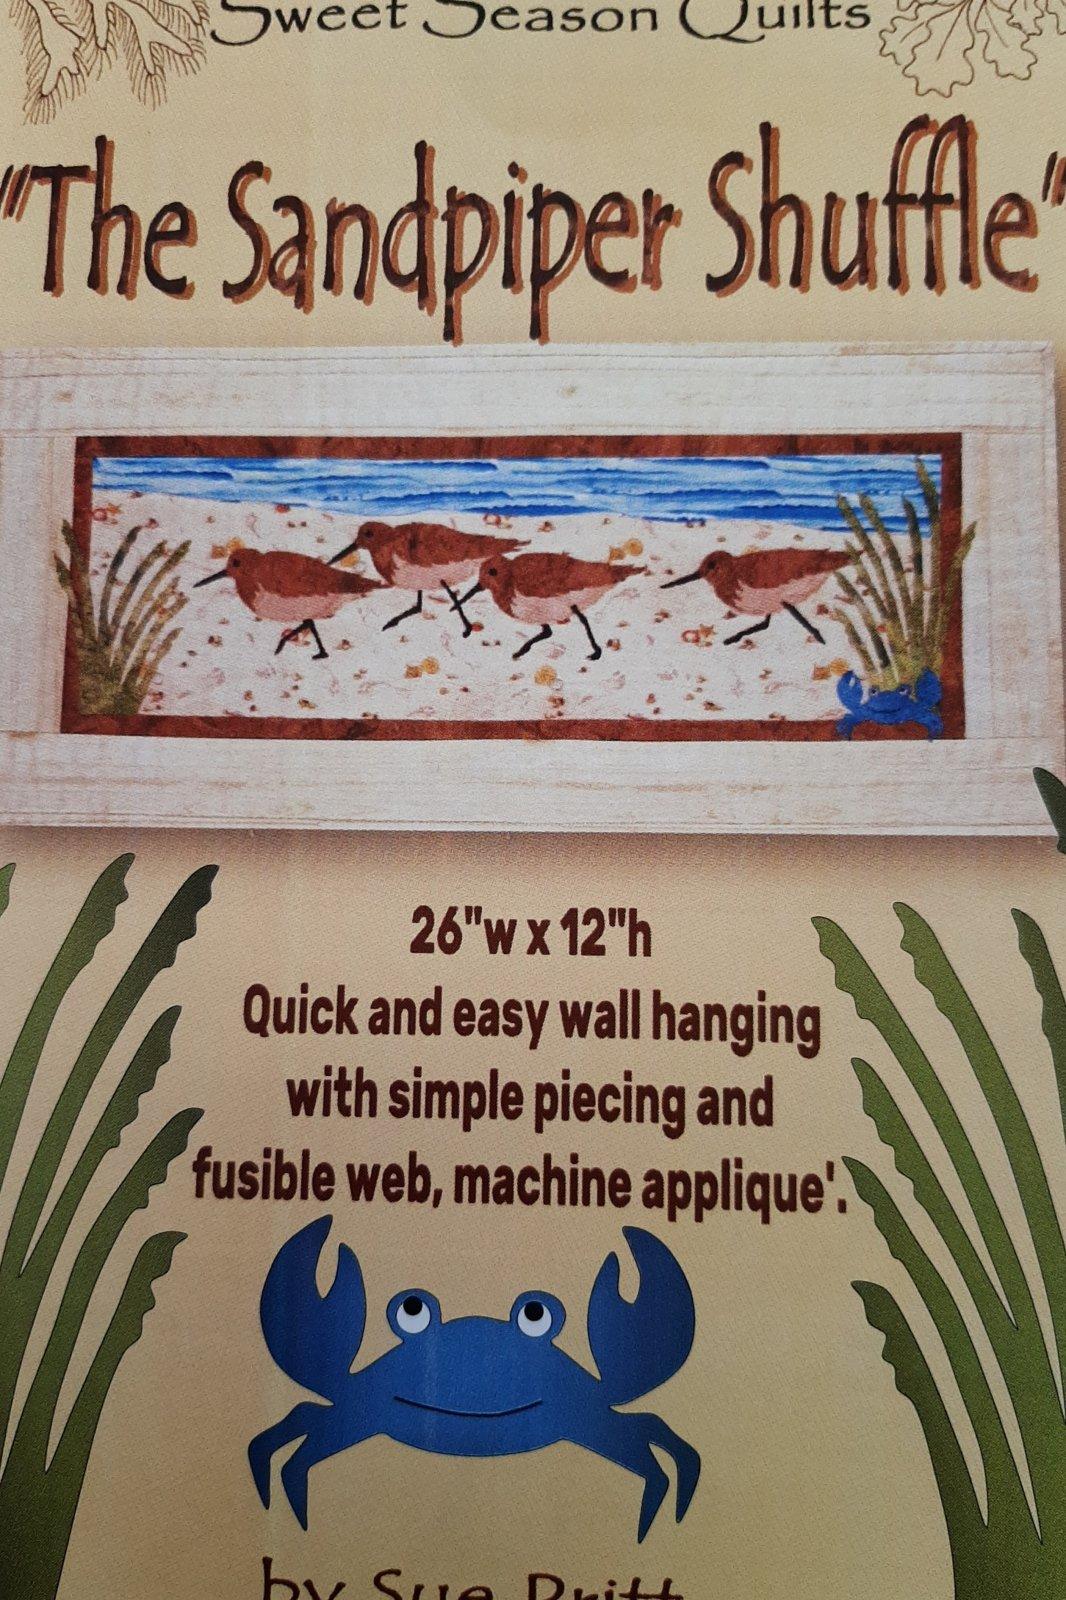 Sweet Seasons Sandpiper Shuffle Kit